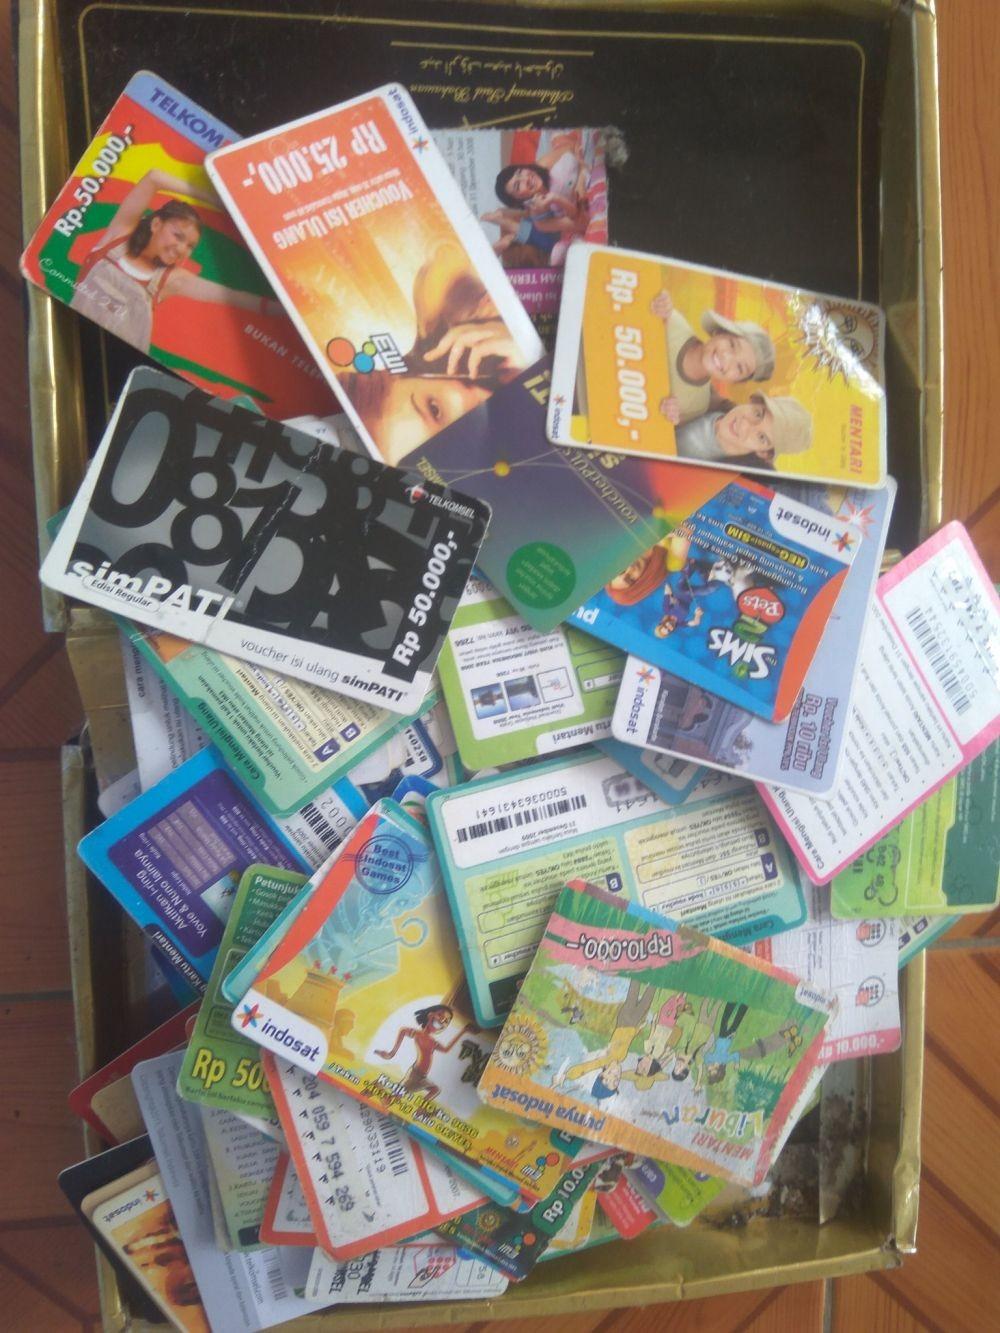 11 Kenangan 2000-an yang Pasti Dirasakan Millennials, Kangen!